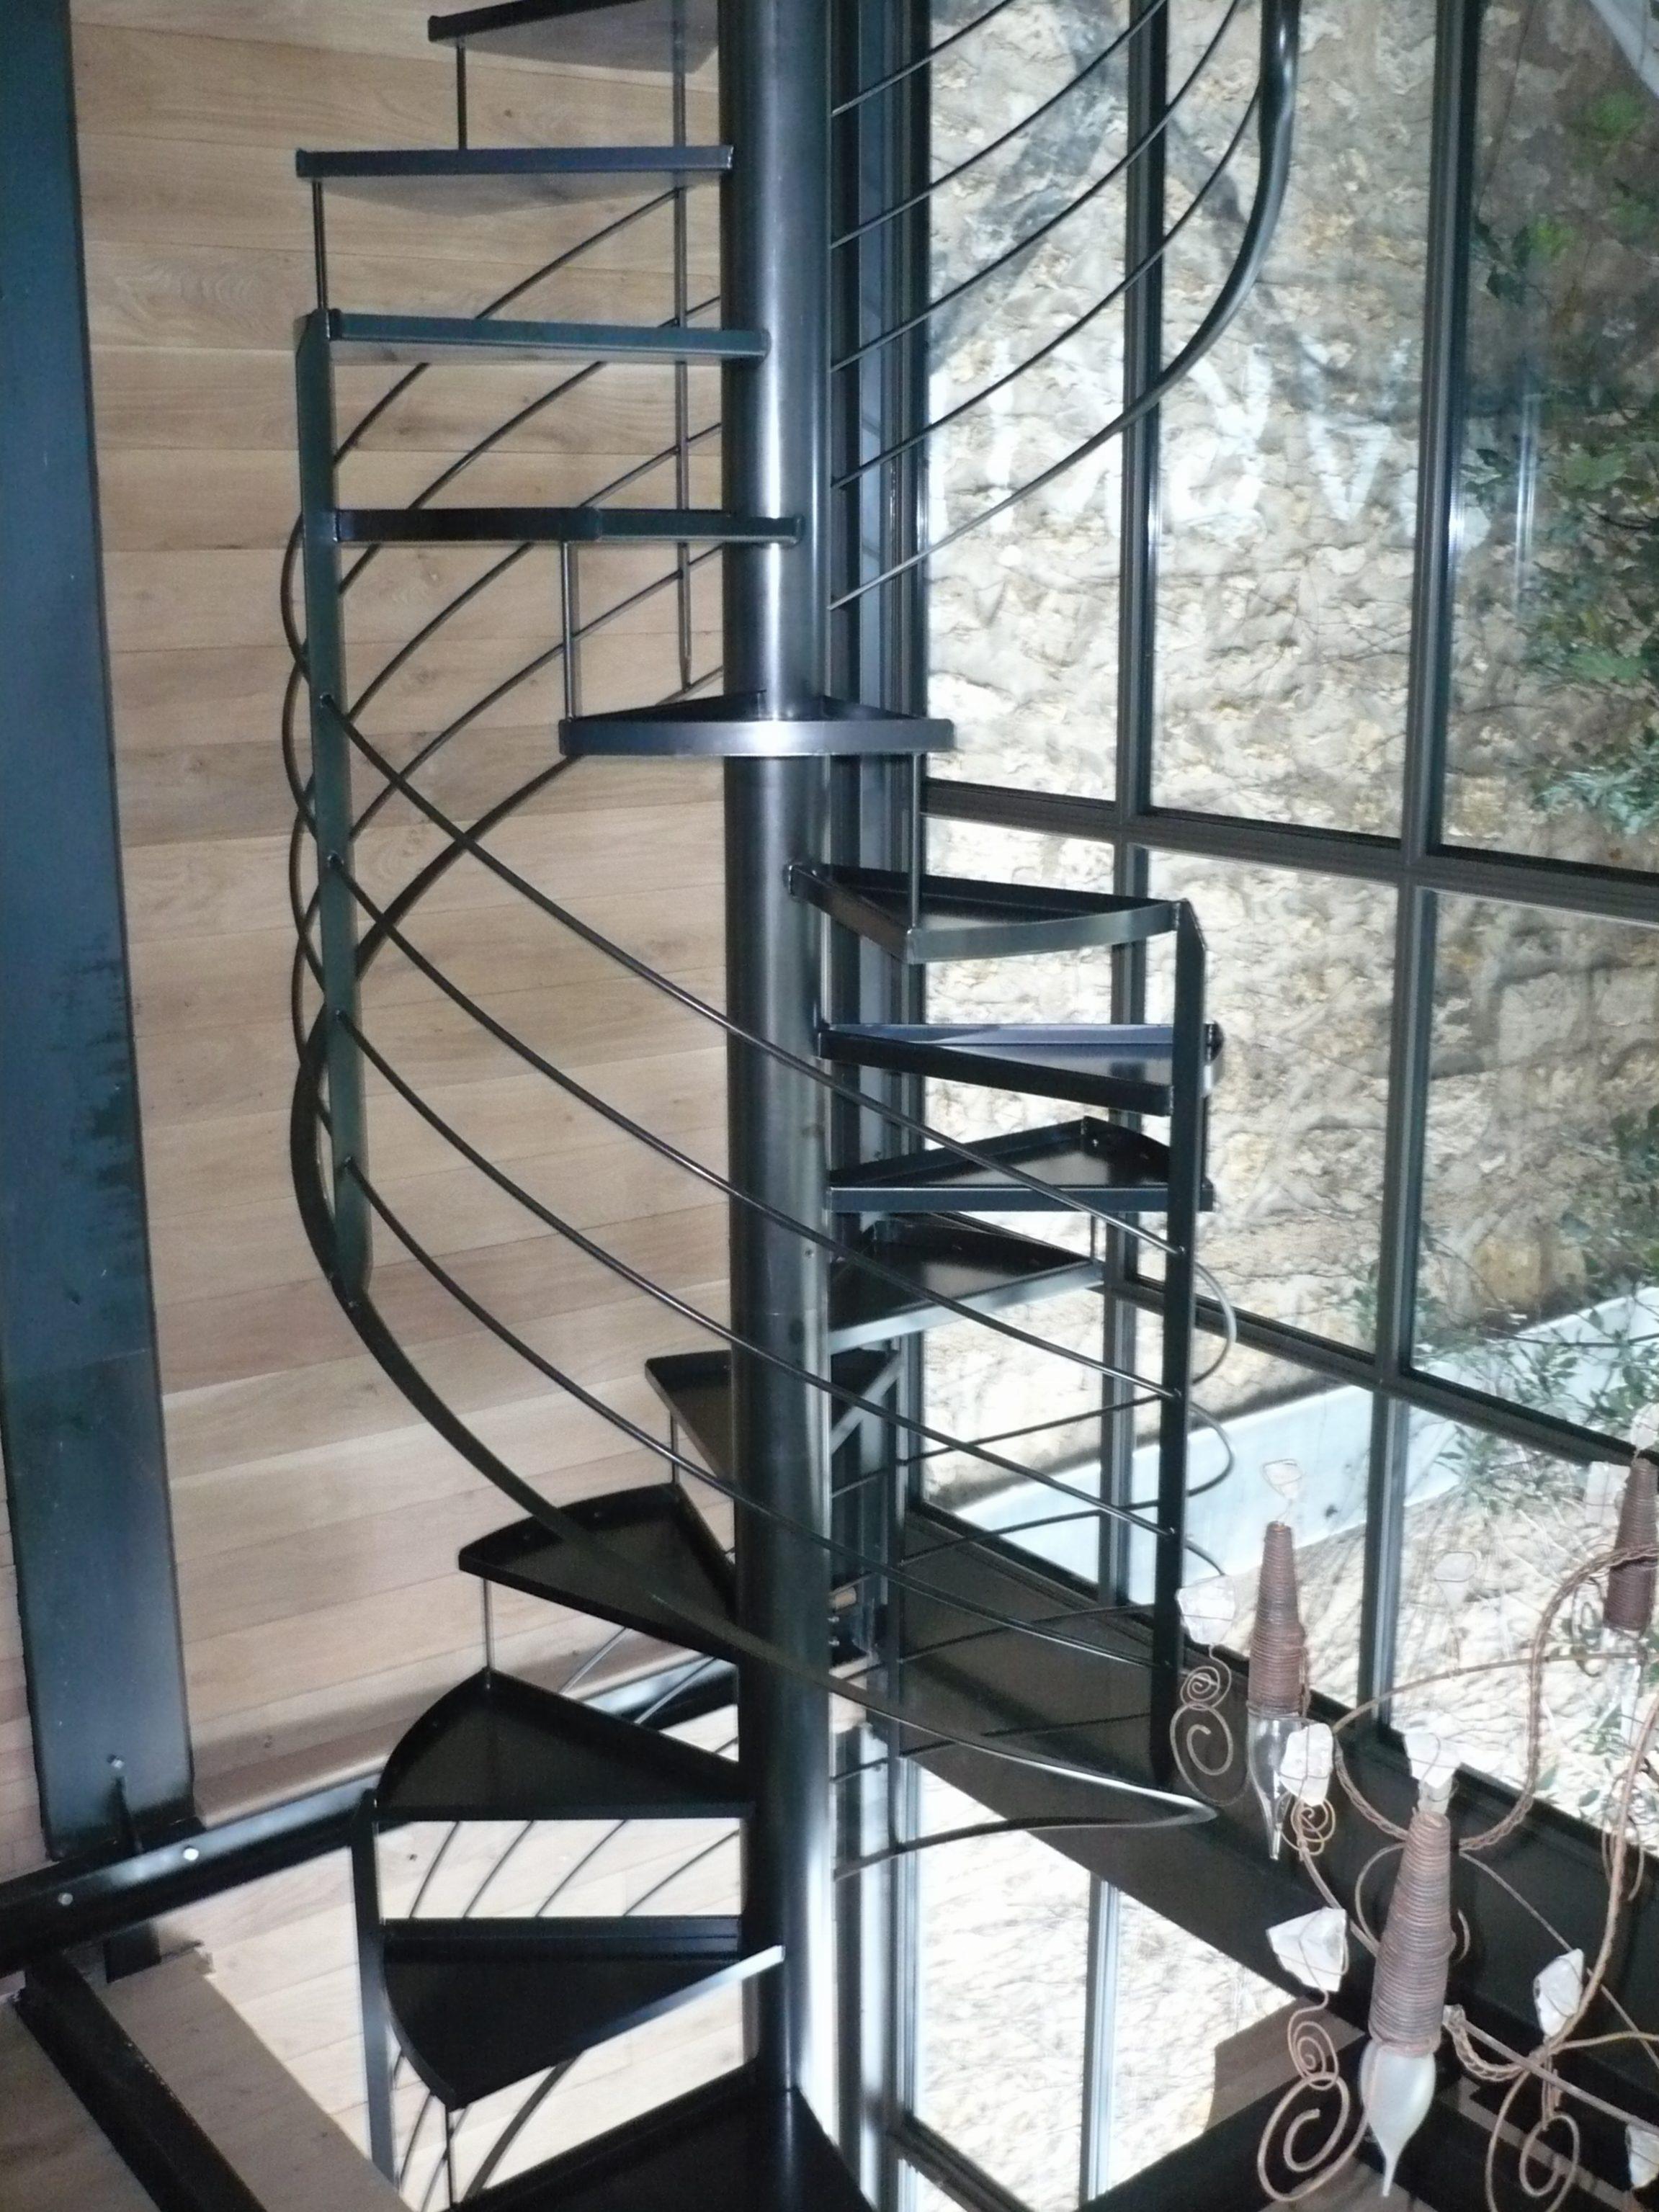 escalier colimaon industriel stunning escalier helicodal industriel en acier galvanis with. Black Bedroom Furniture Sets. Home Design Ideas